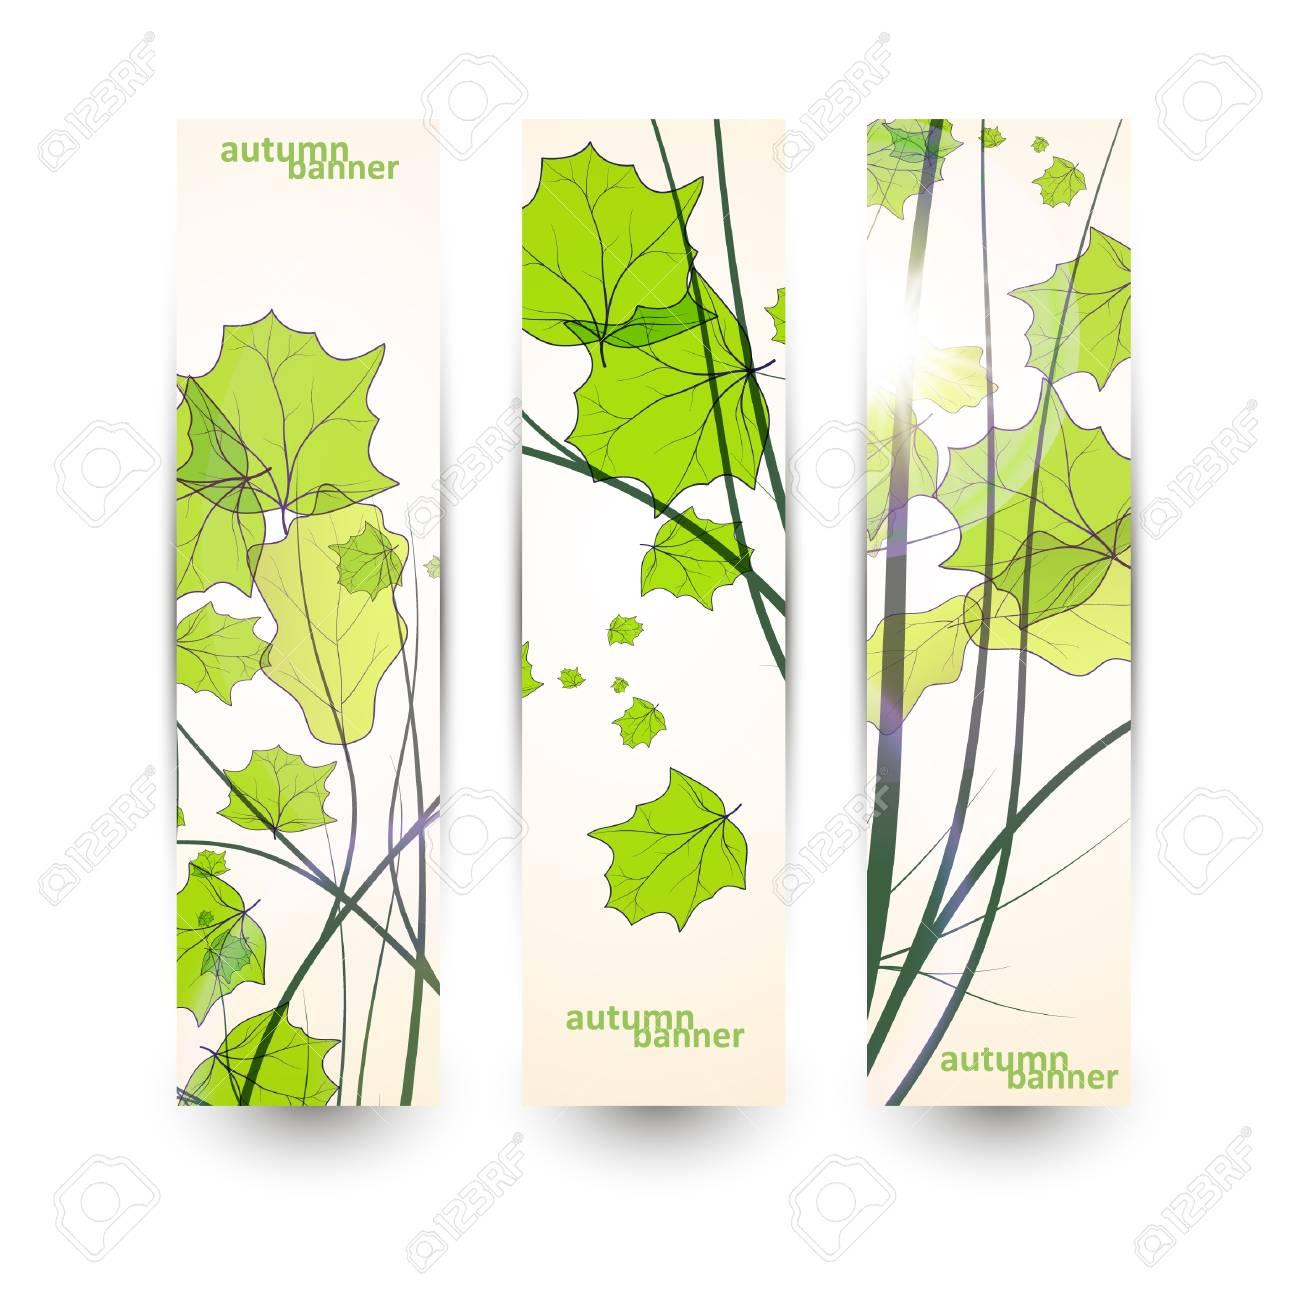 Autumn banner set, vector illustration eps10 Stock Vector - 15192245